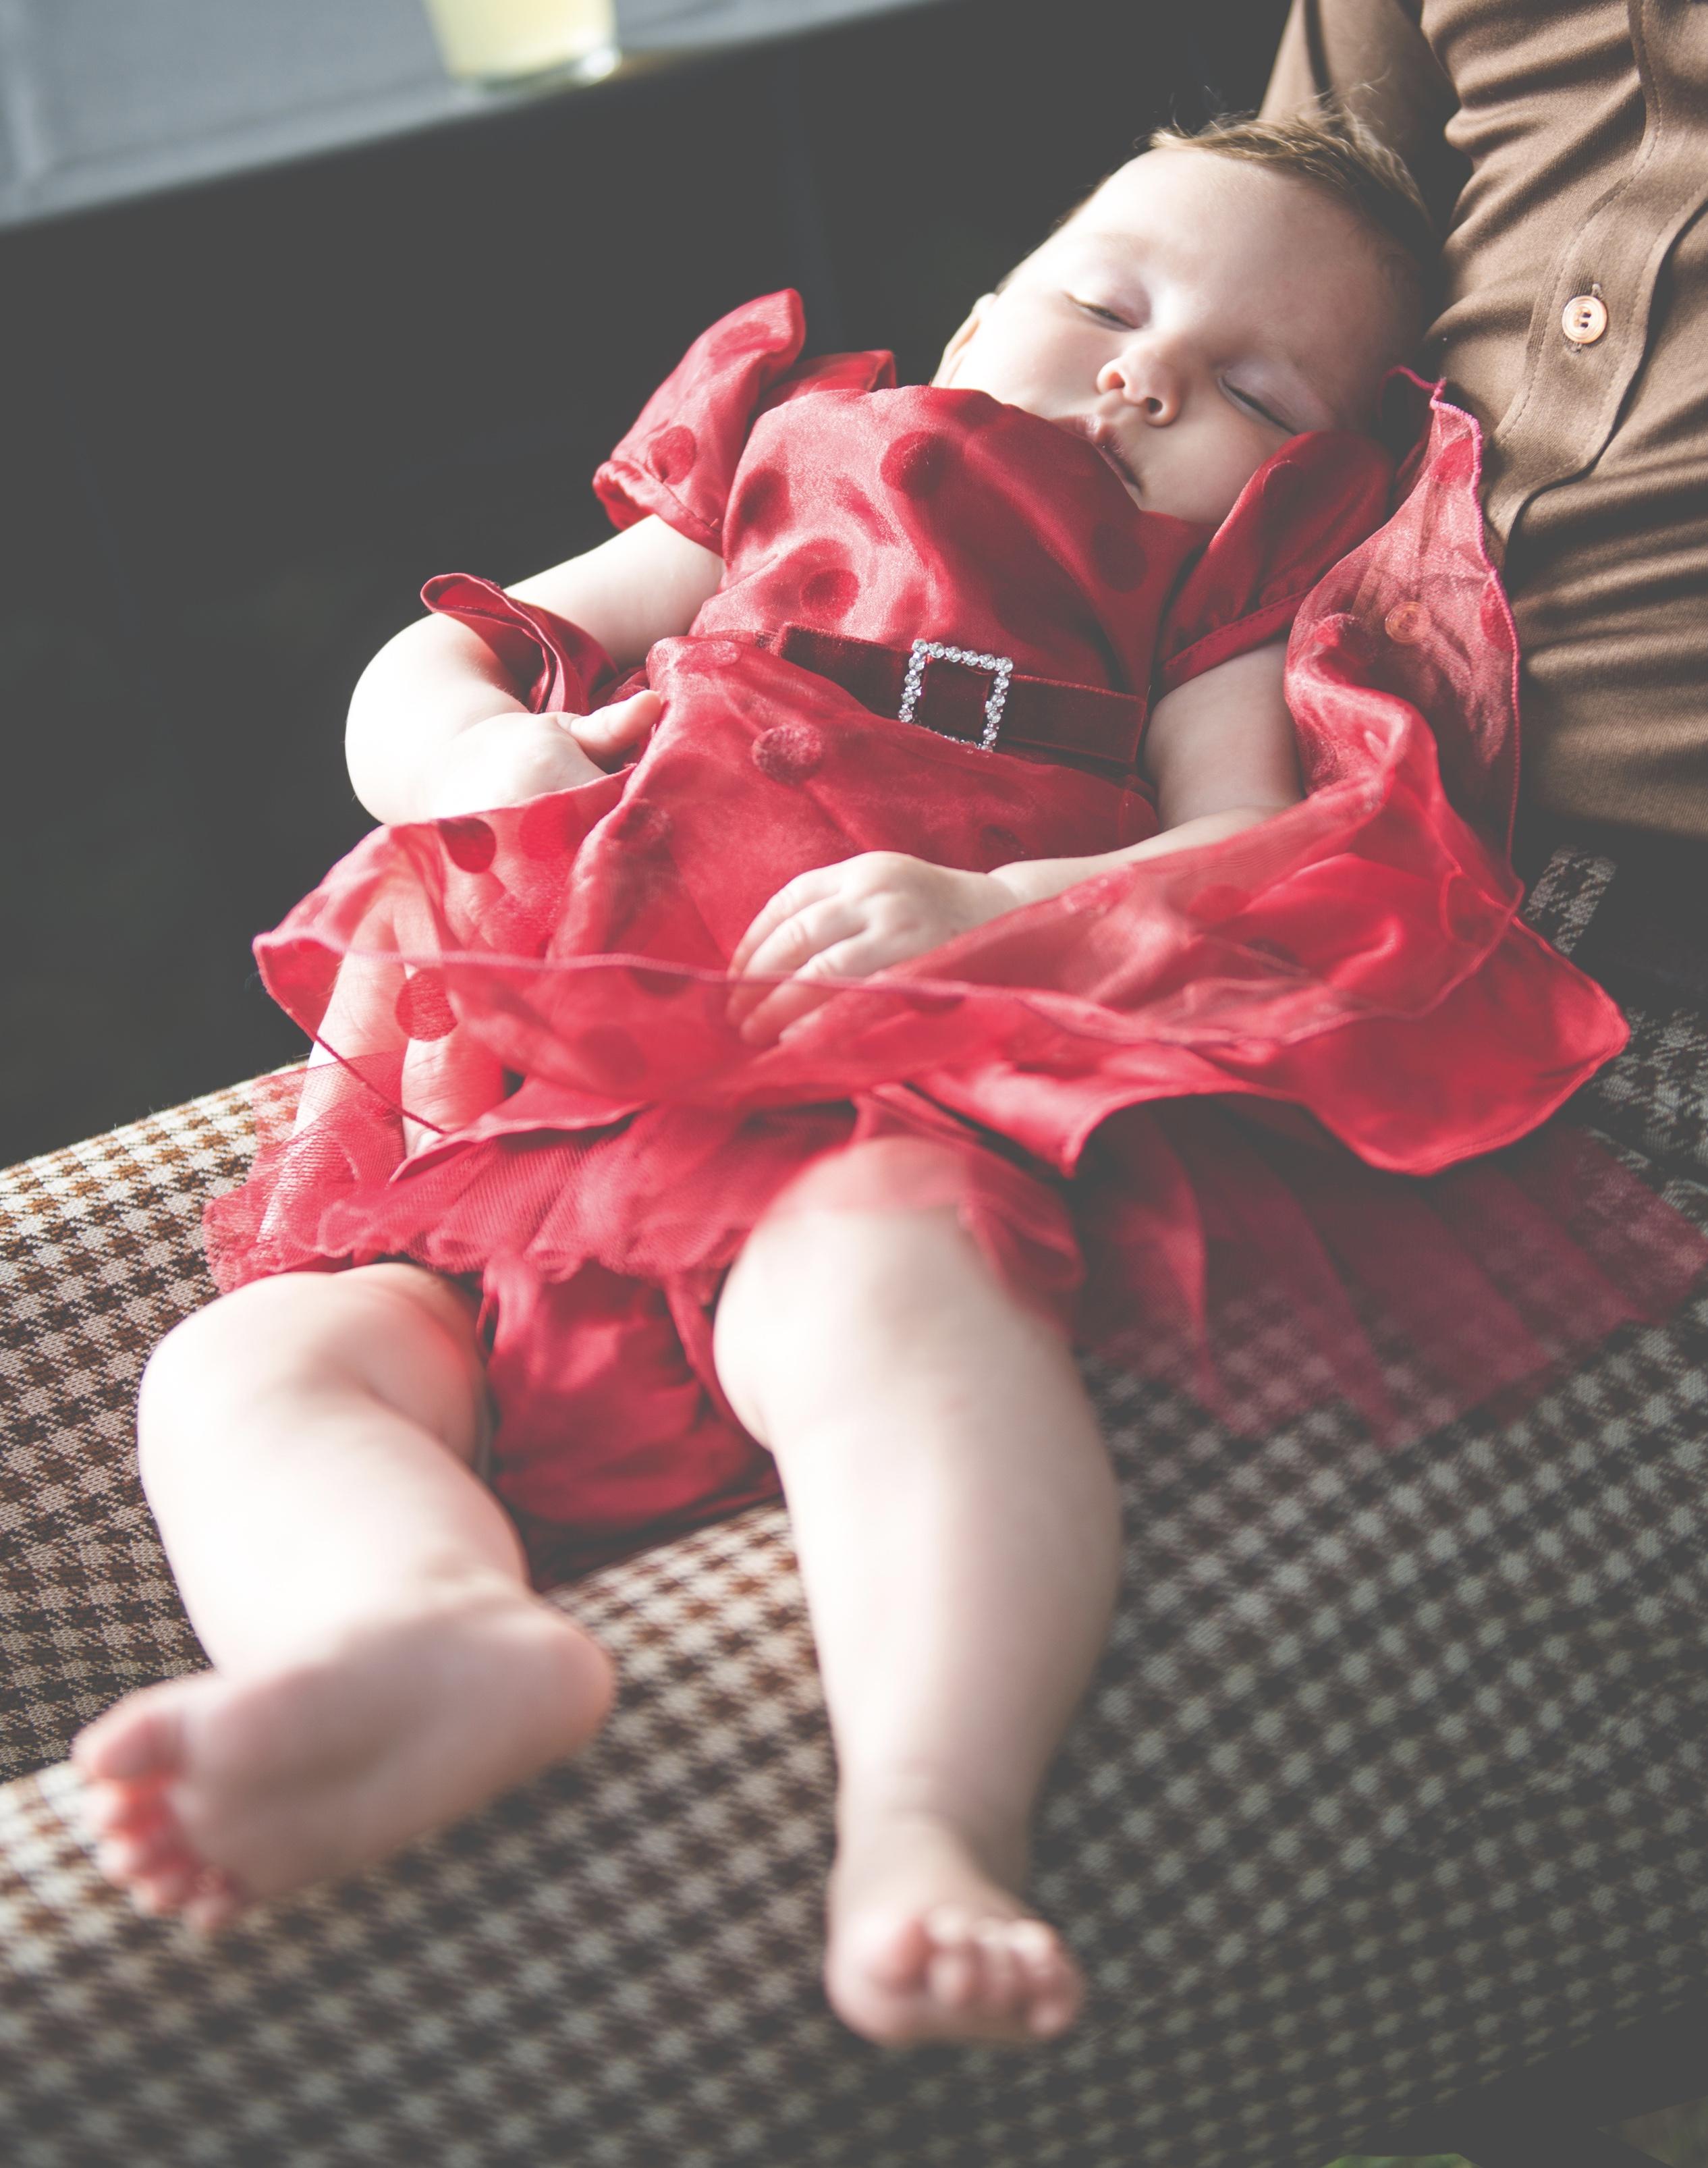 Sleeping baby on parent's lap.